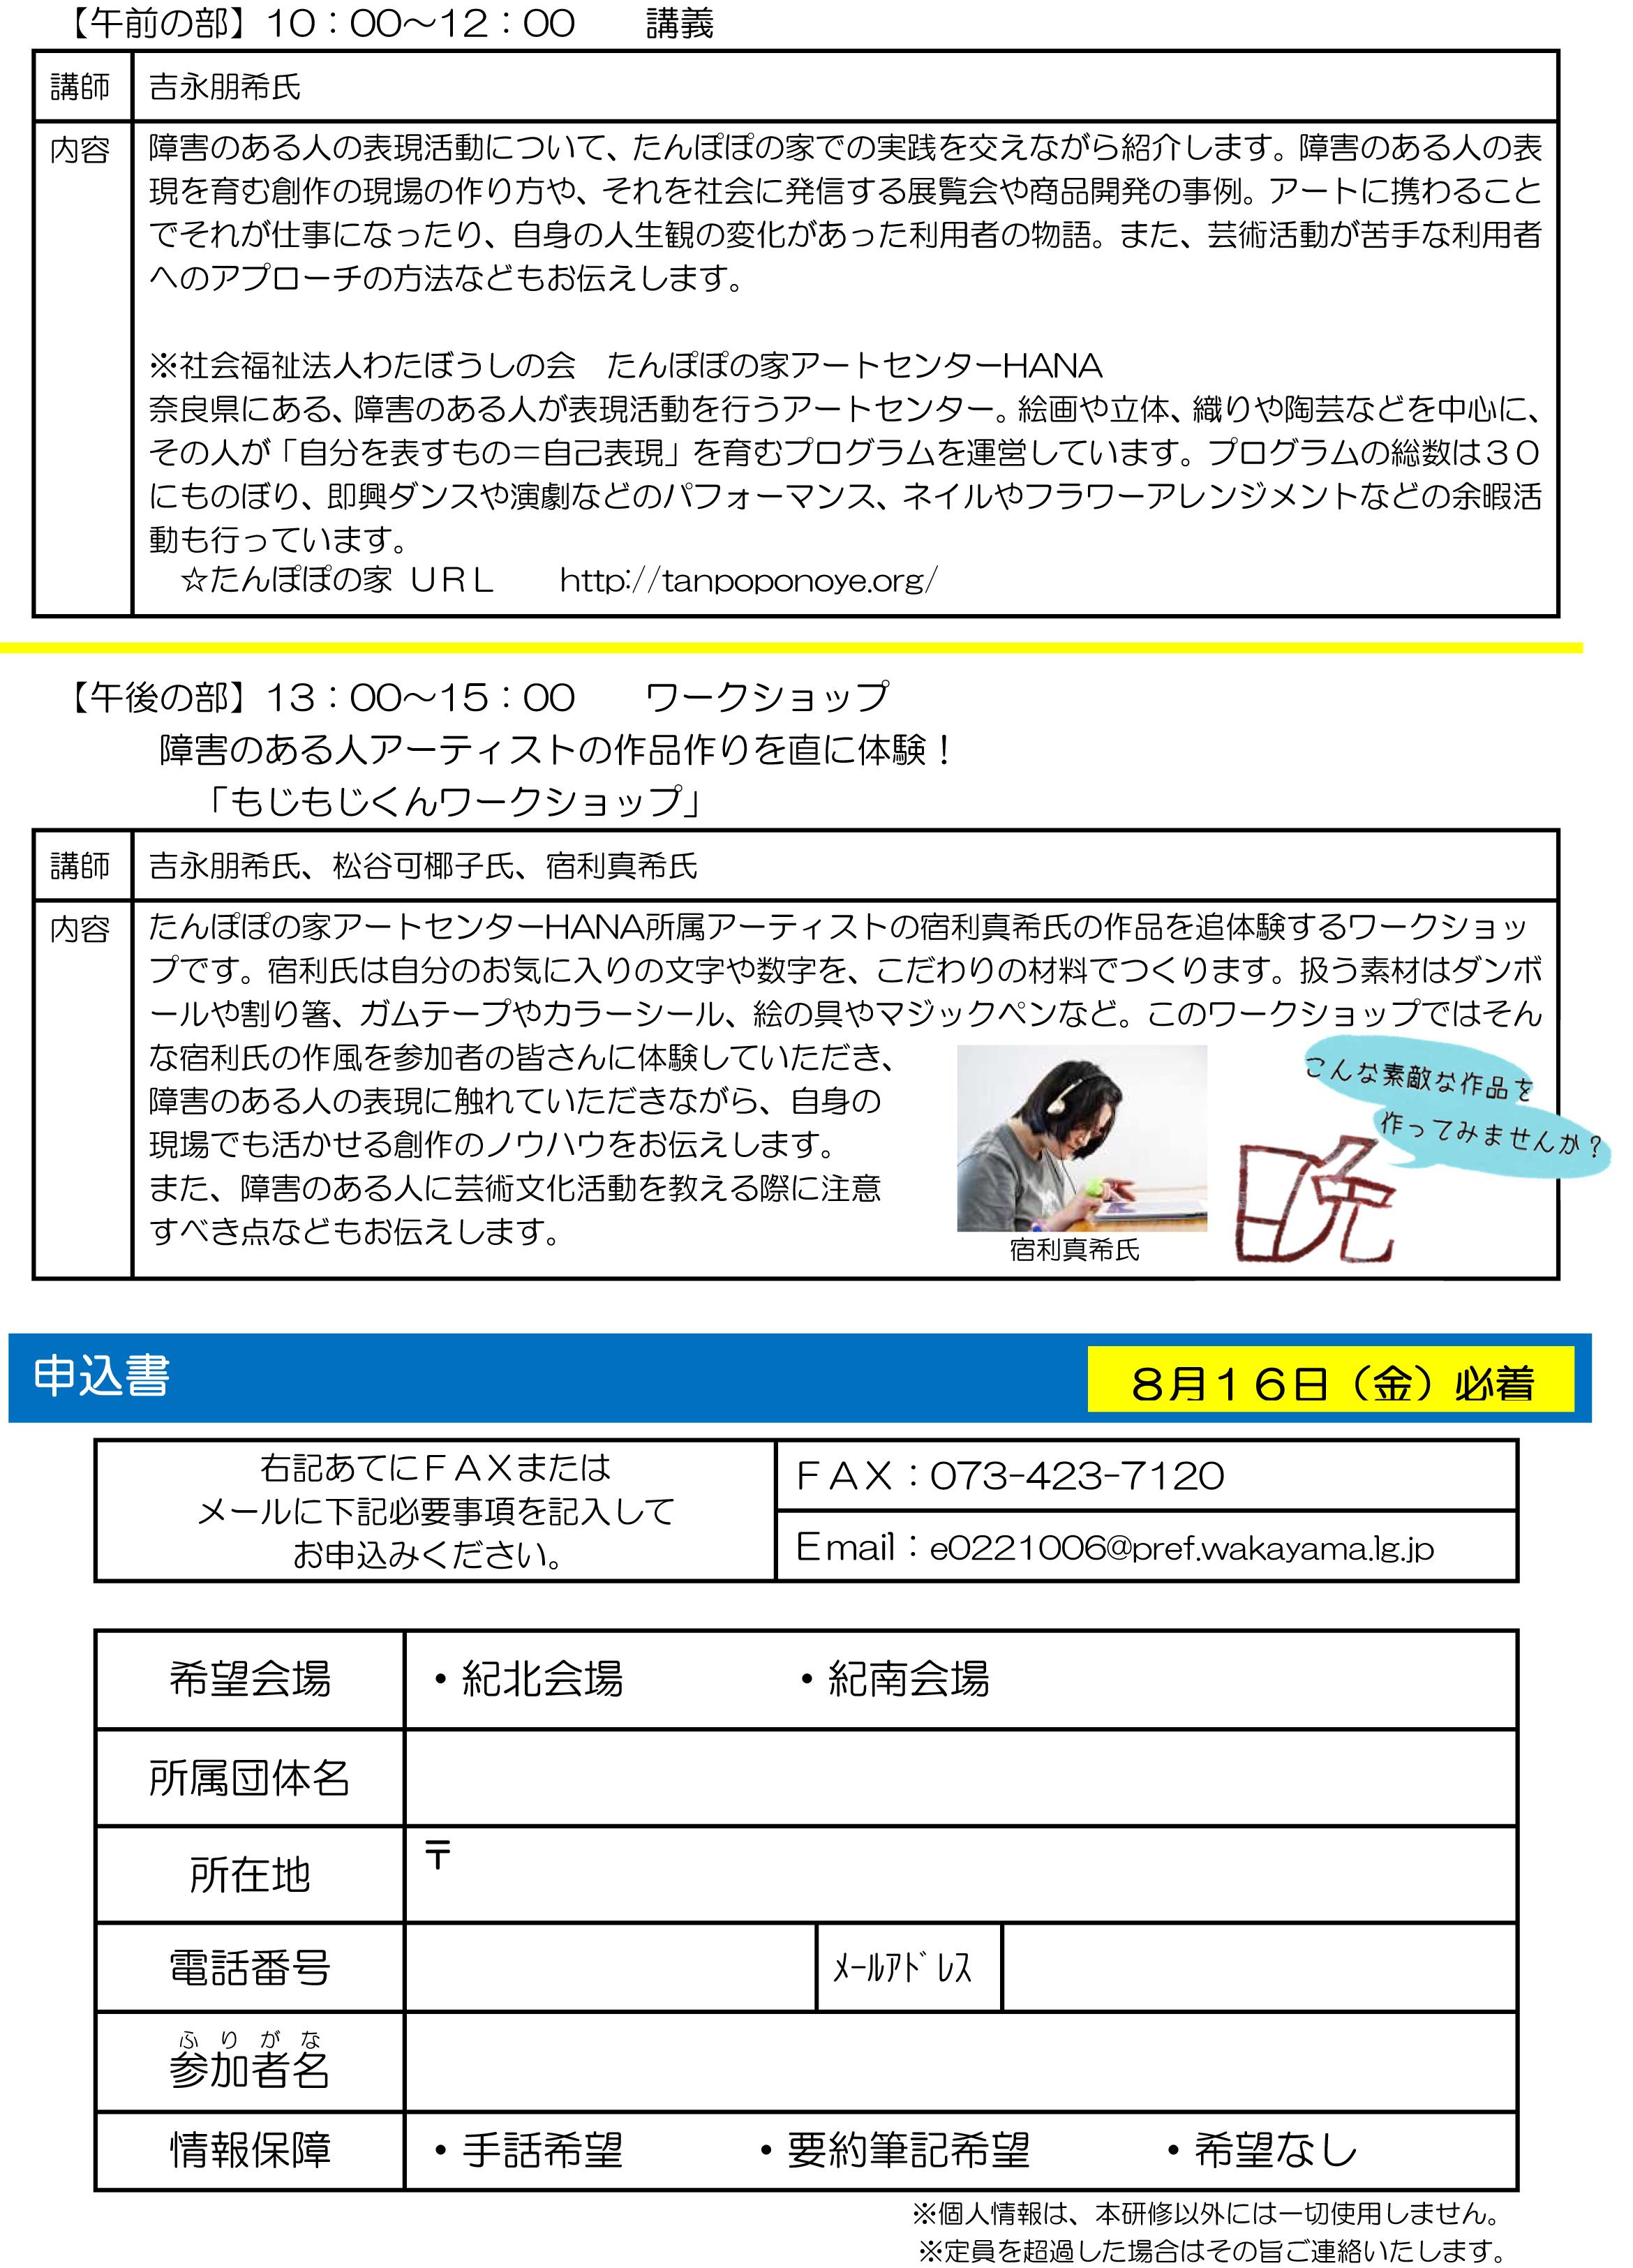 Microsoft Word - 人材育成研修チラシ ver02